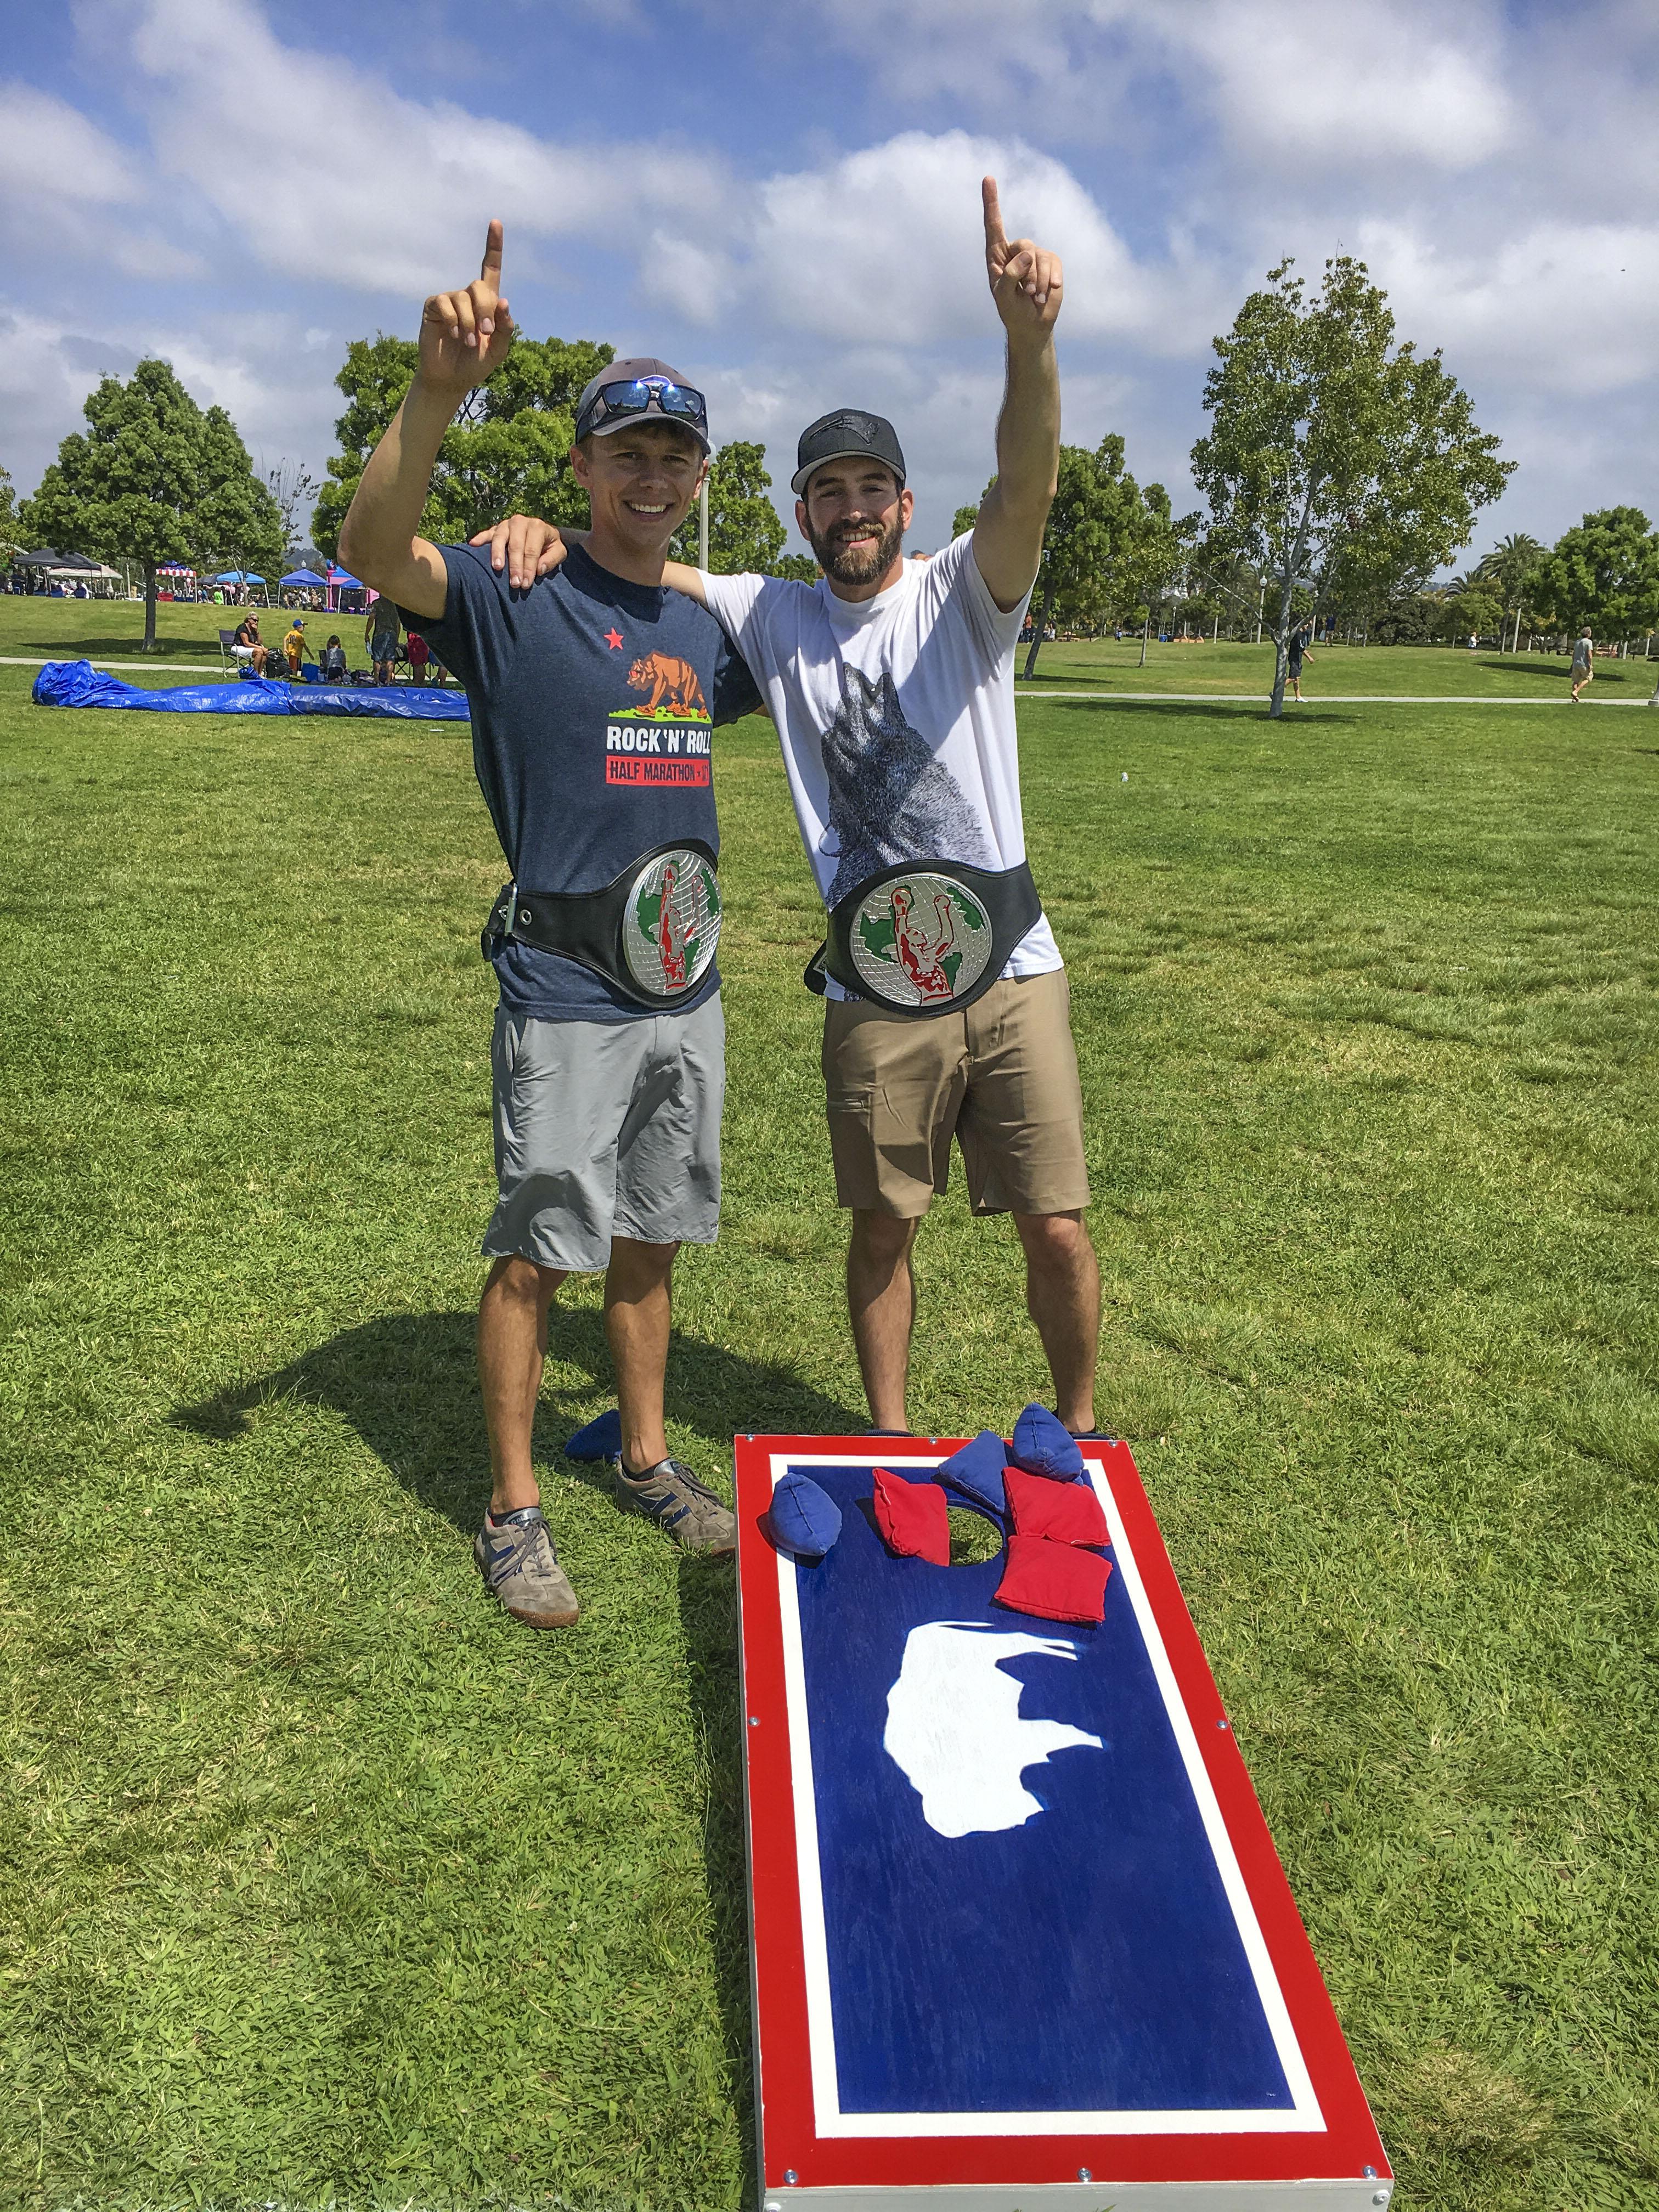 SIGNs Cornhole 2017 Winners - Mark Holmes and Trent Hellman